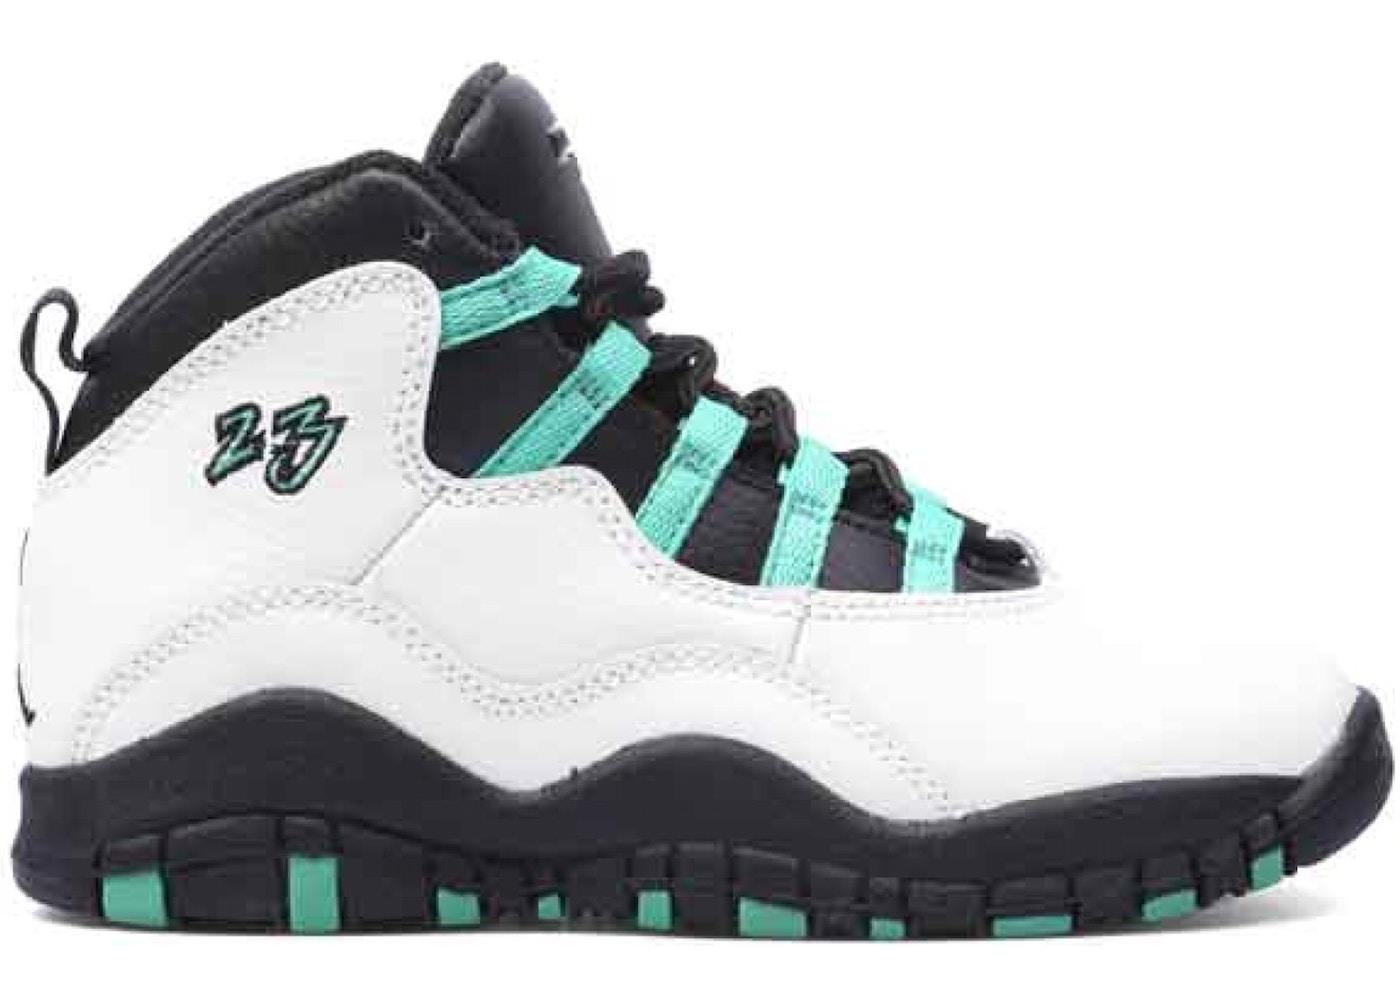 new style 567ad d6370 Buy Air Jordan 10 Shoes   Deadstock Sneakers